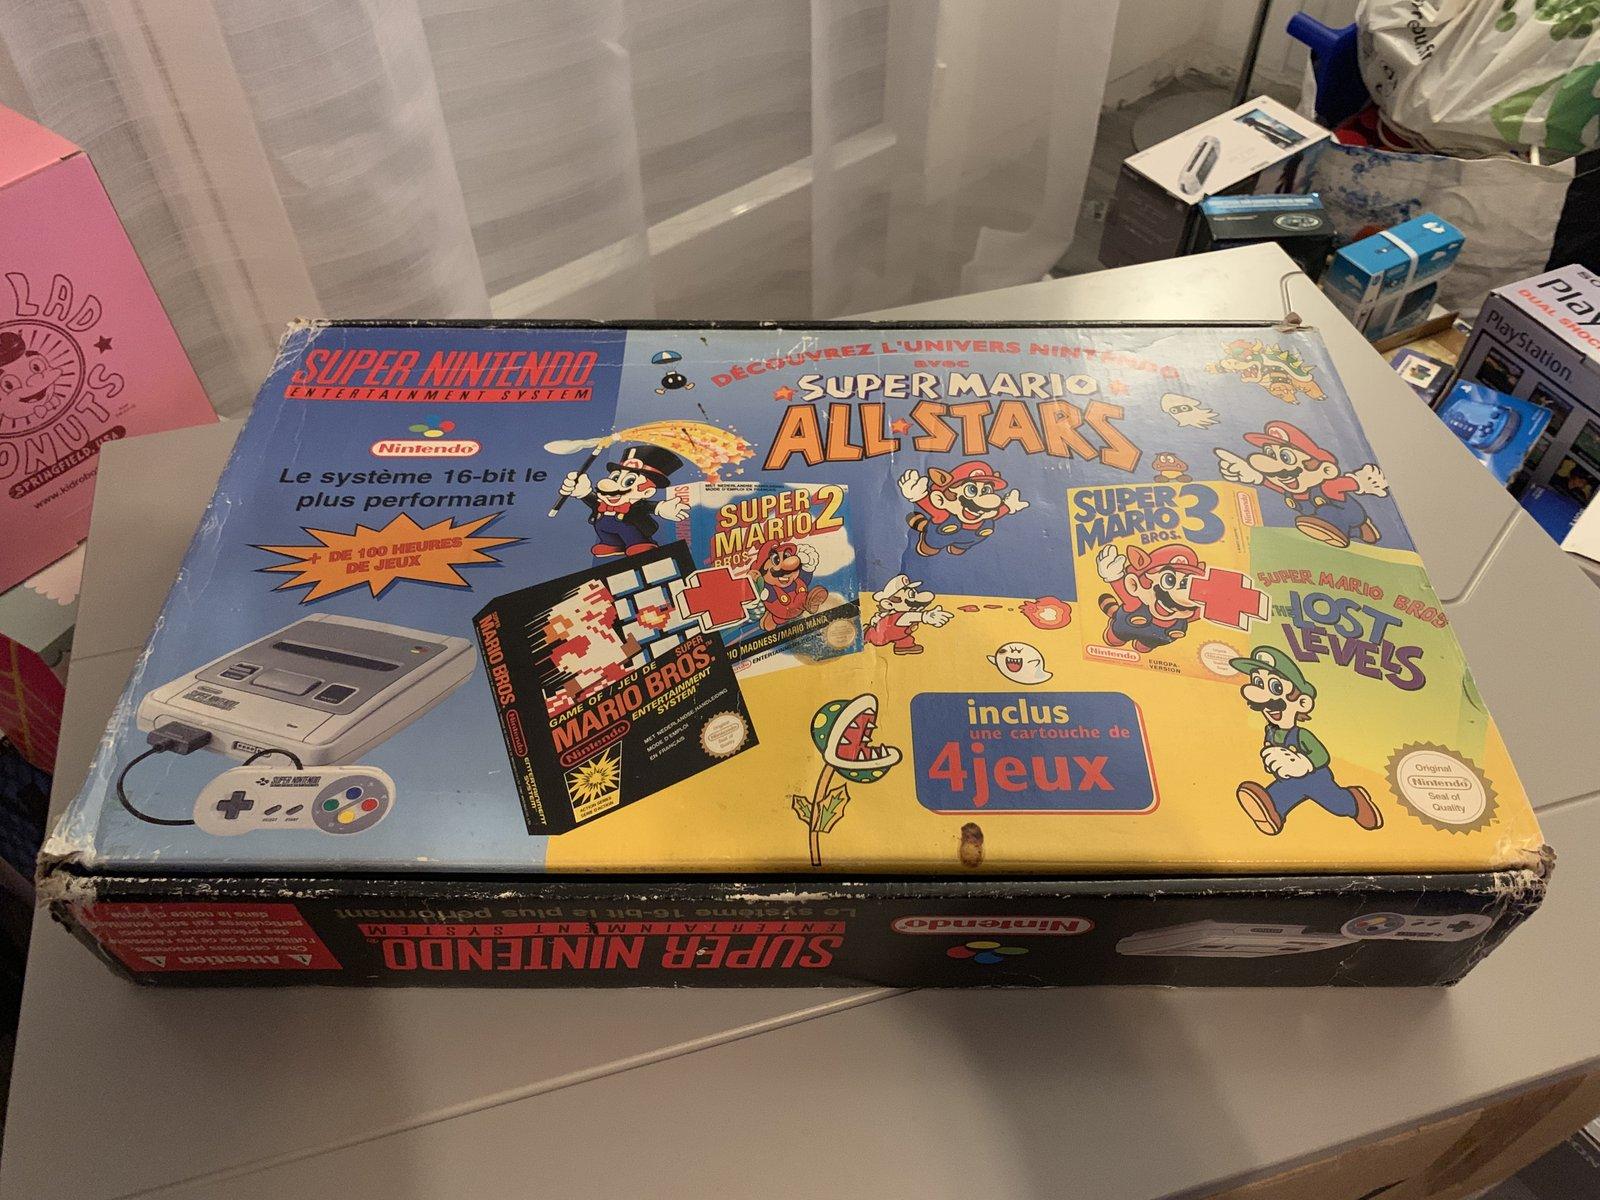 [VDS] Pack NES Action Set - PSP Simpsons - XBOX King Kong... Consoles en pack complet 191007045220280110